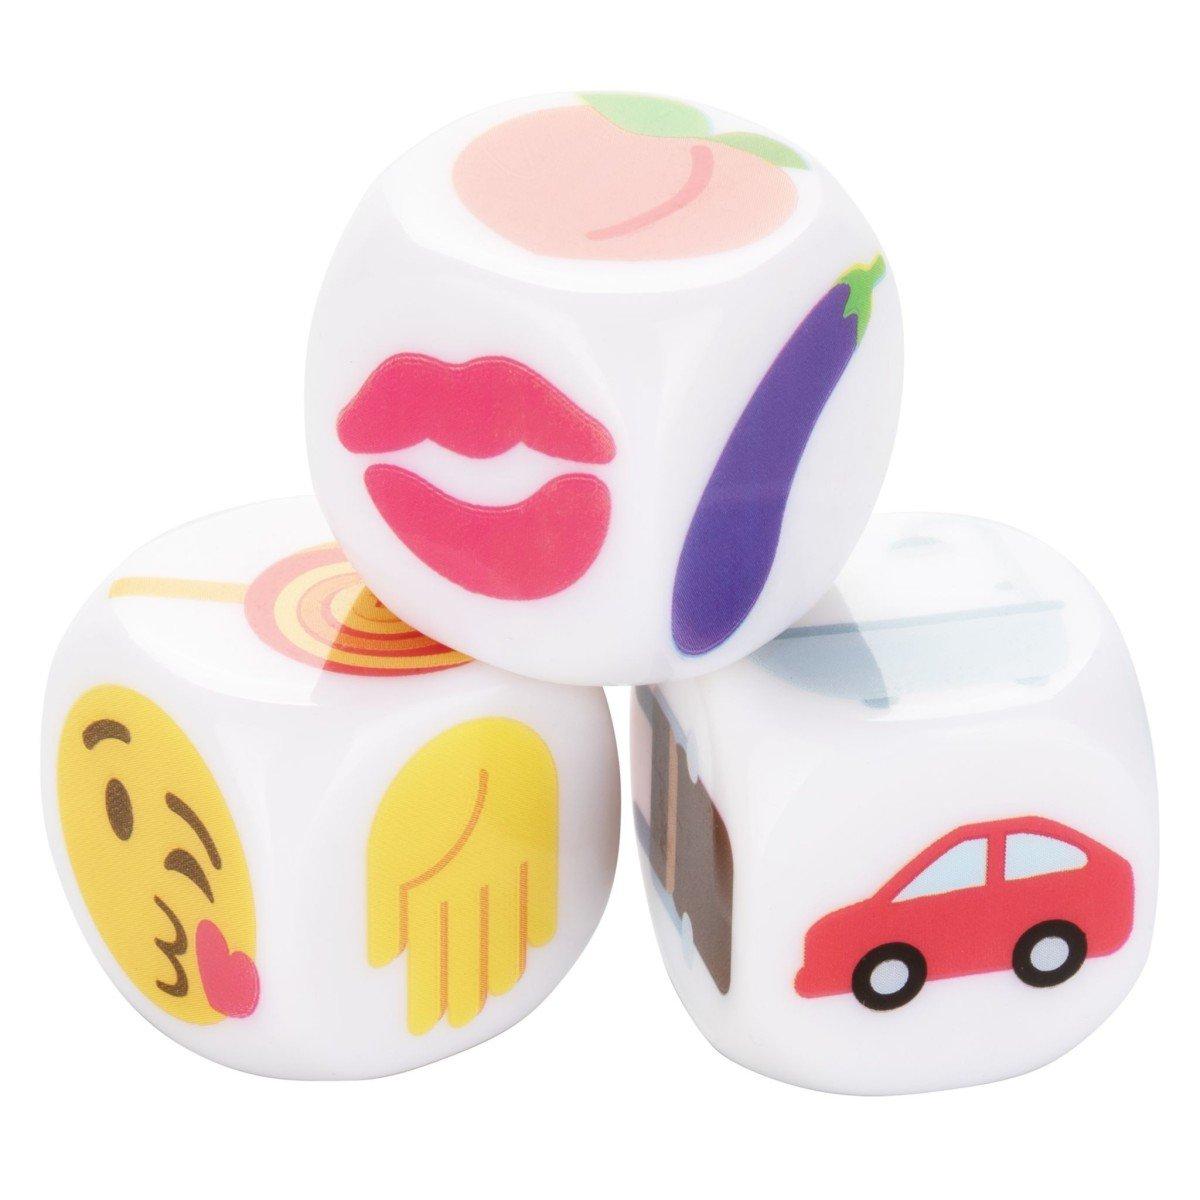 CalExotics Emojigasm Dice, erotické hrací kostky